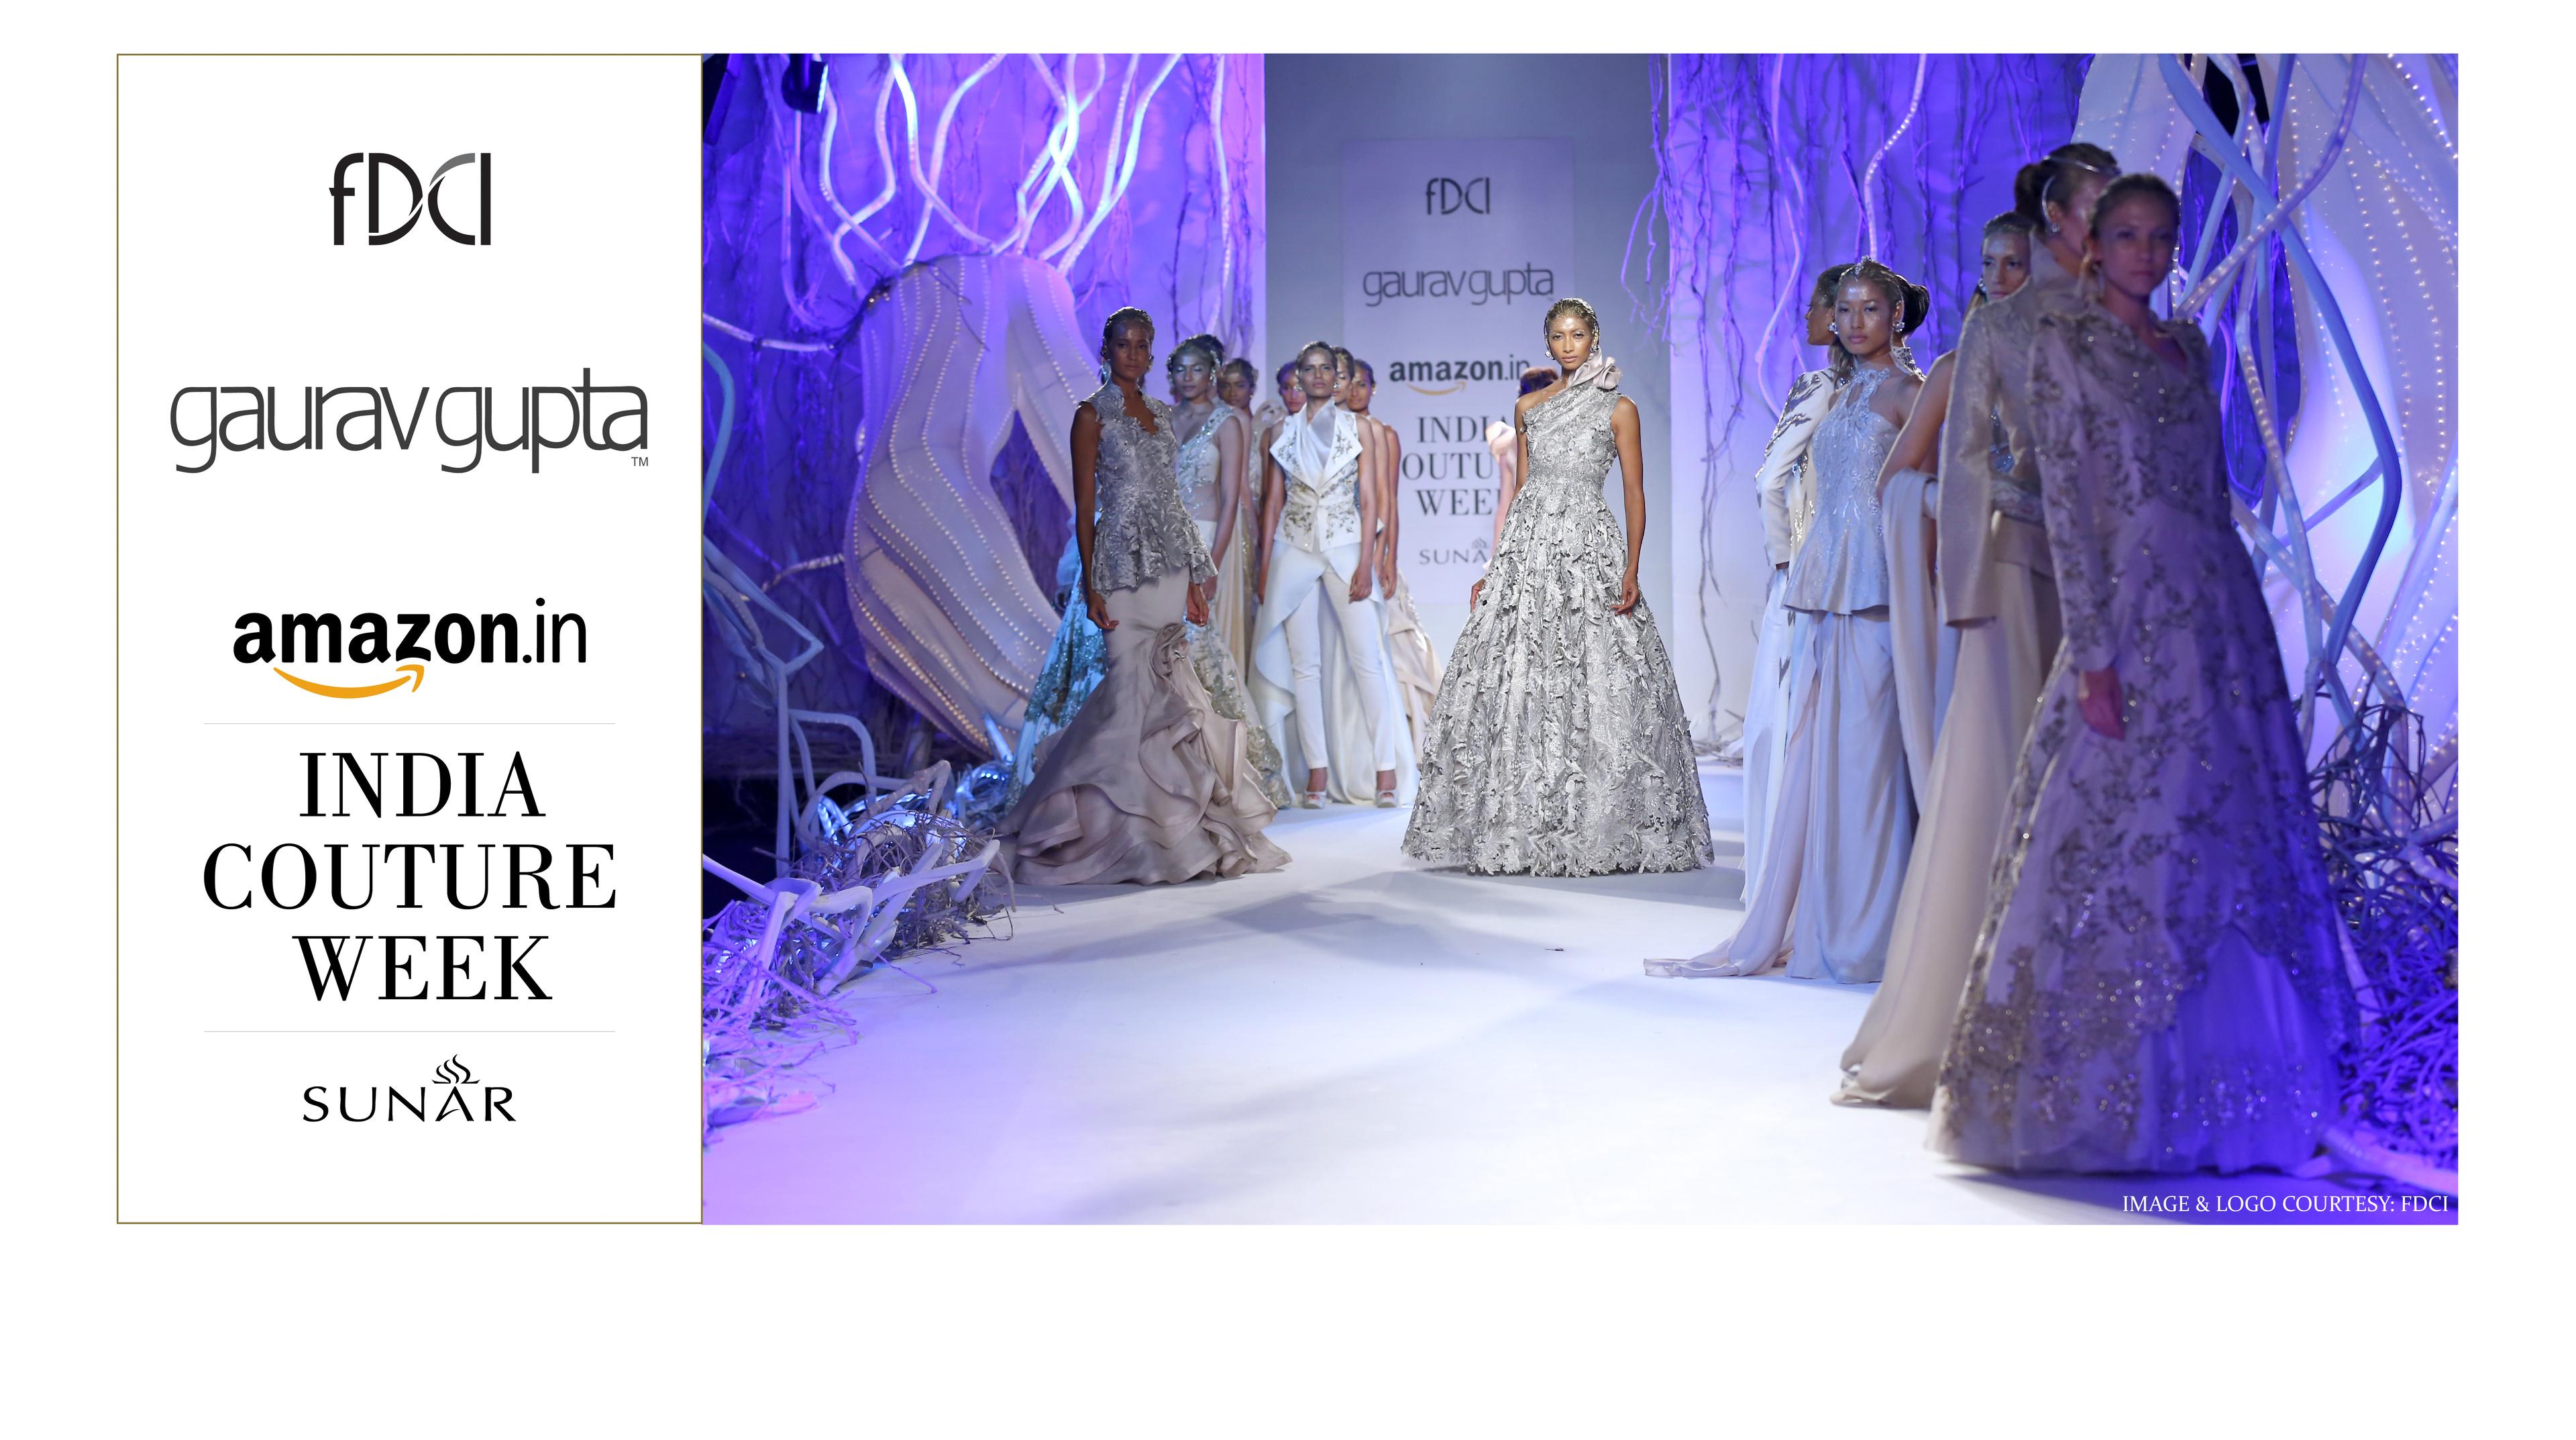 Fashion Show Backdrop Branding 3